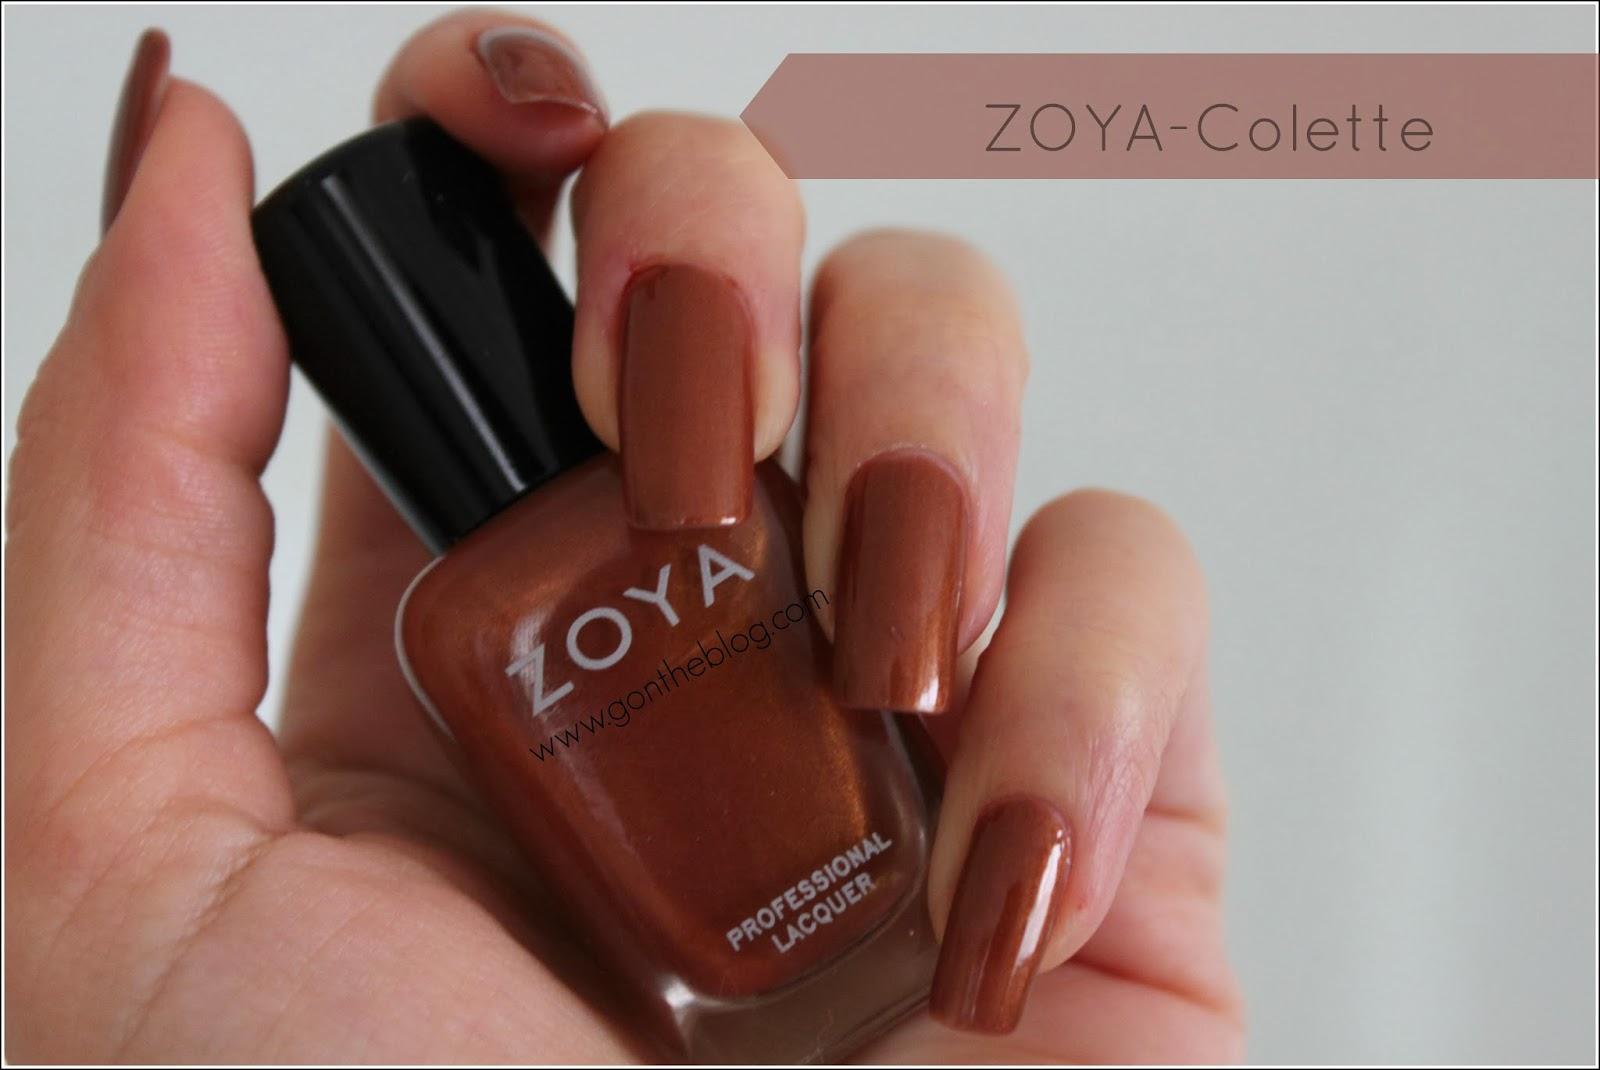 Zoya Colette